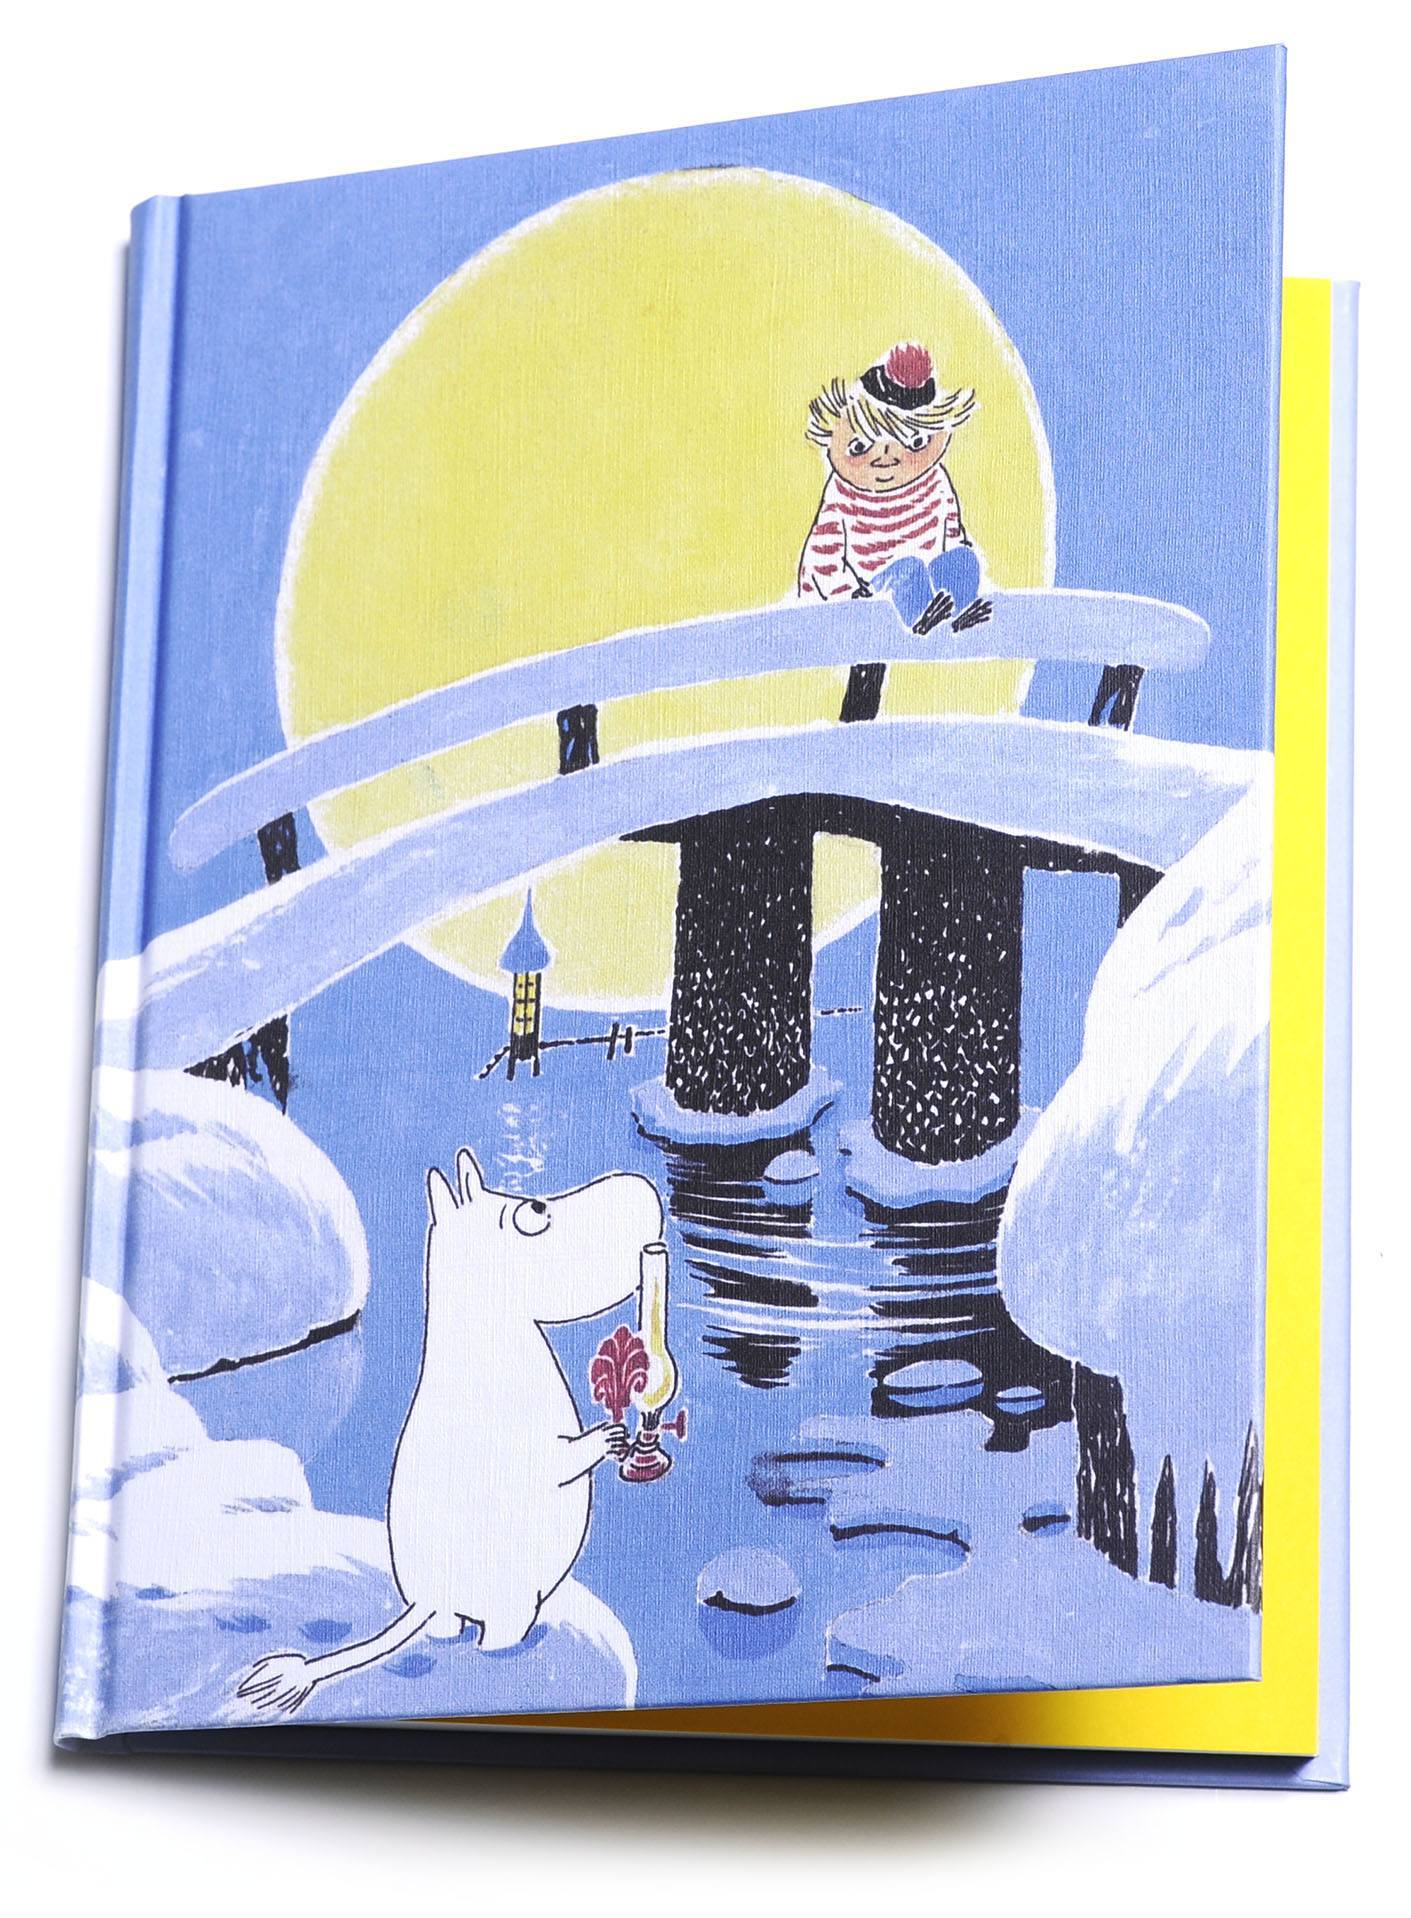 Putinki Hardcover Notebook Moominland Midwinter Bridge